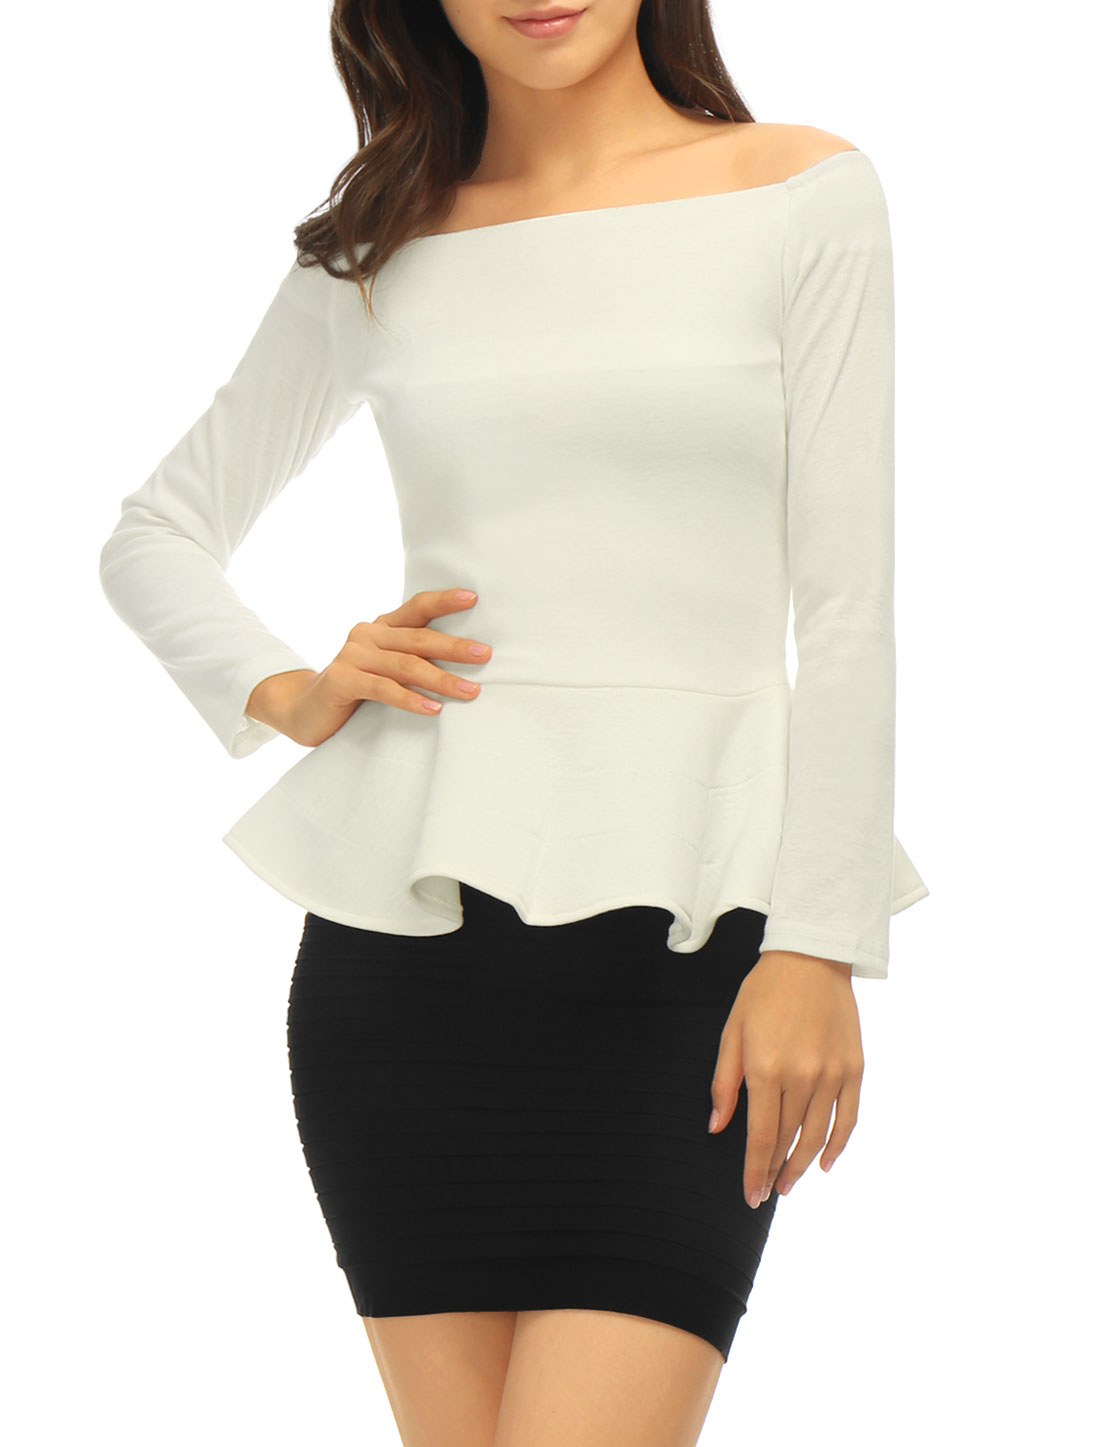 Women Off Shoulder Long Sleeves Slim Fit Peplum Top White XL